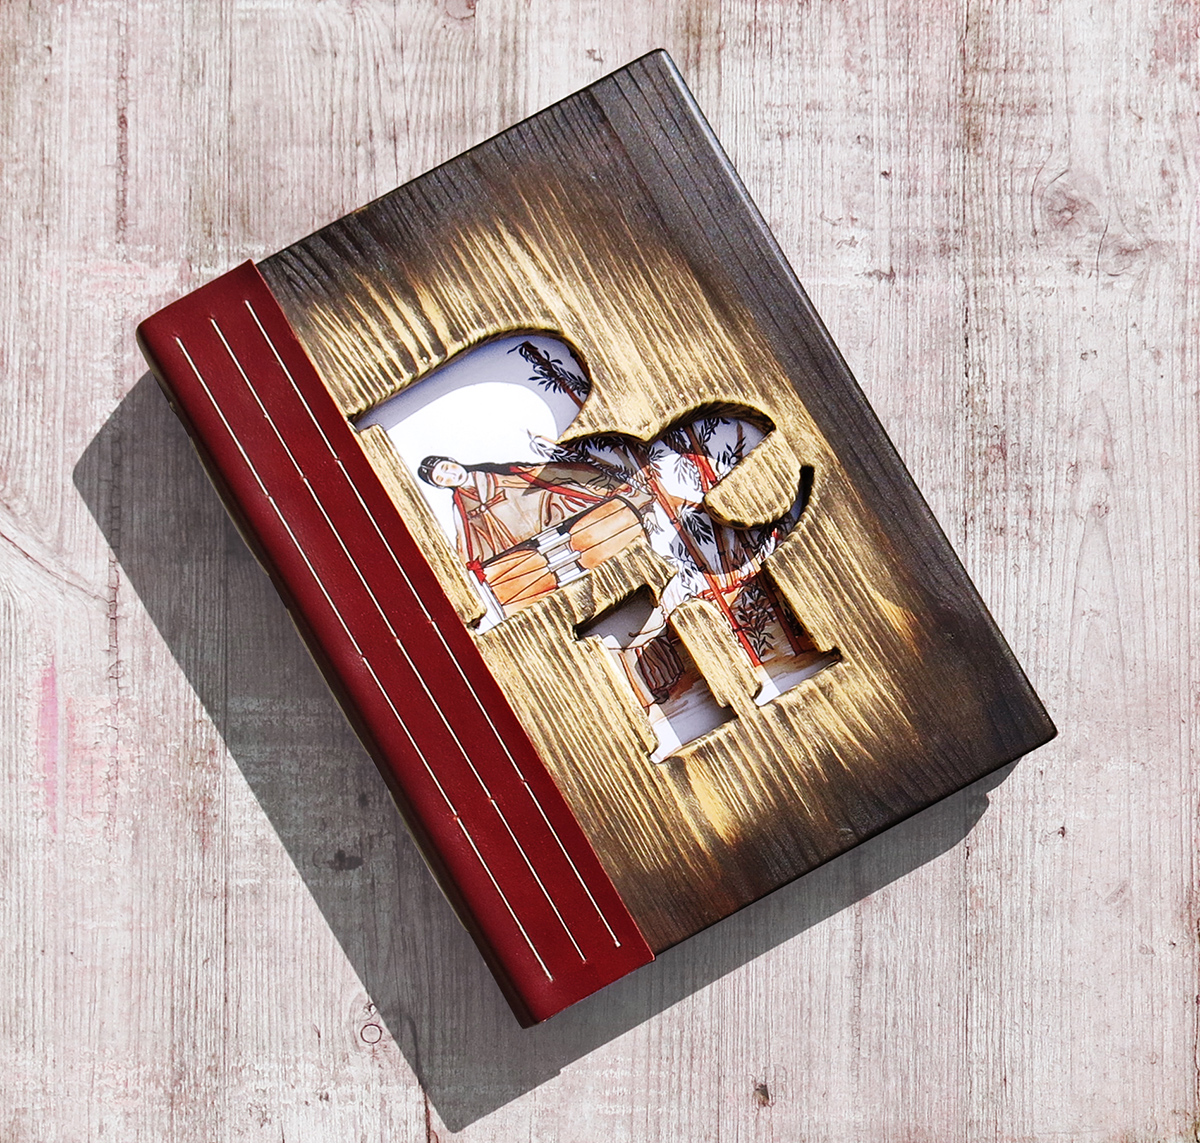 Bookbinding – Wood – Ben